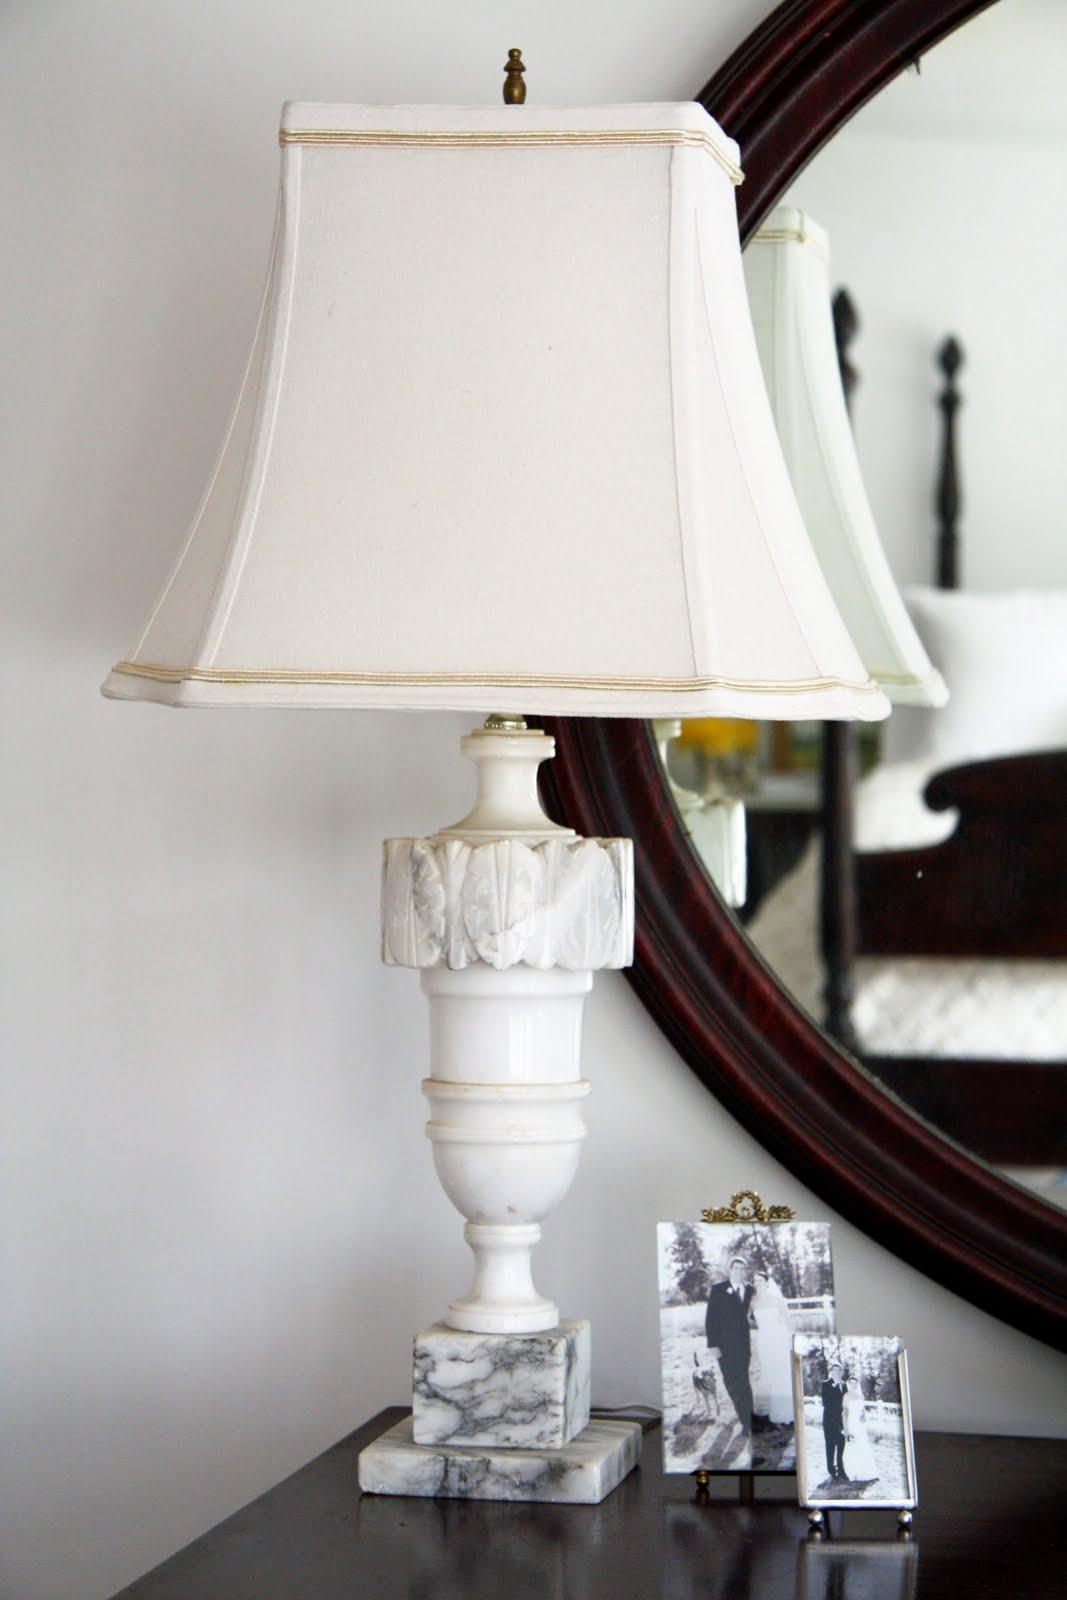 10 main functions of vintage marble lamps warisan lighting 10 main functions of vintage marble lamps geotapseo Gallery